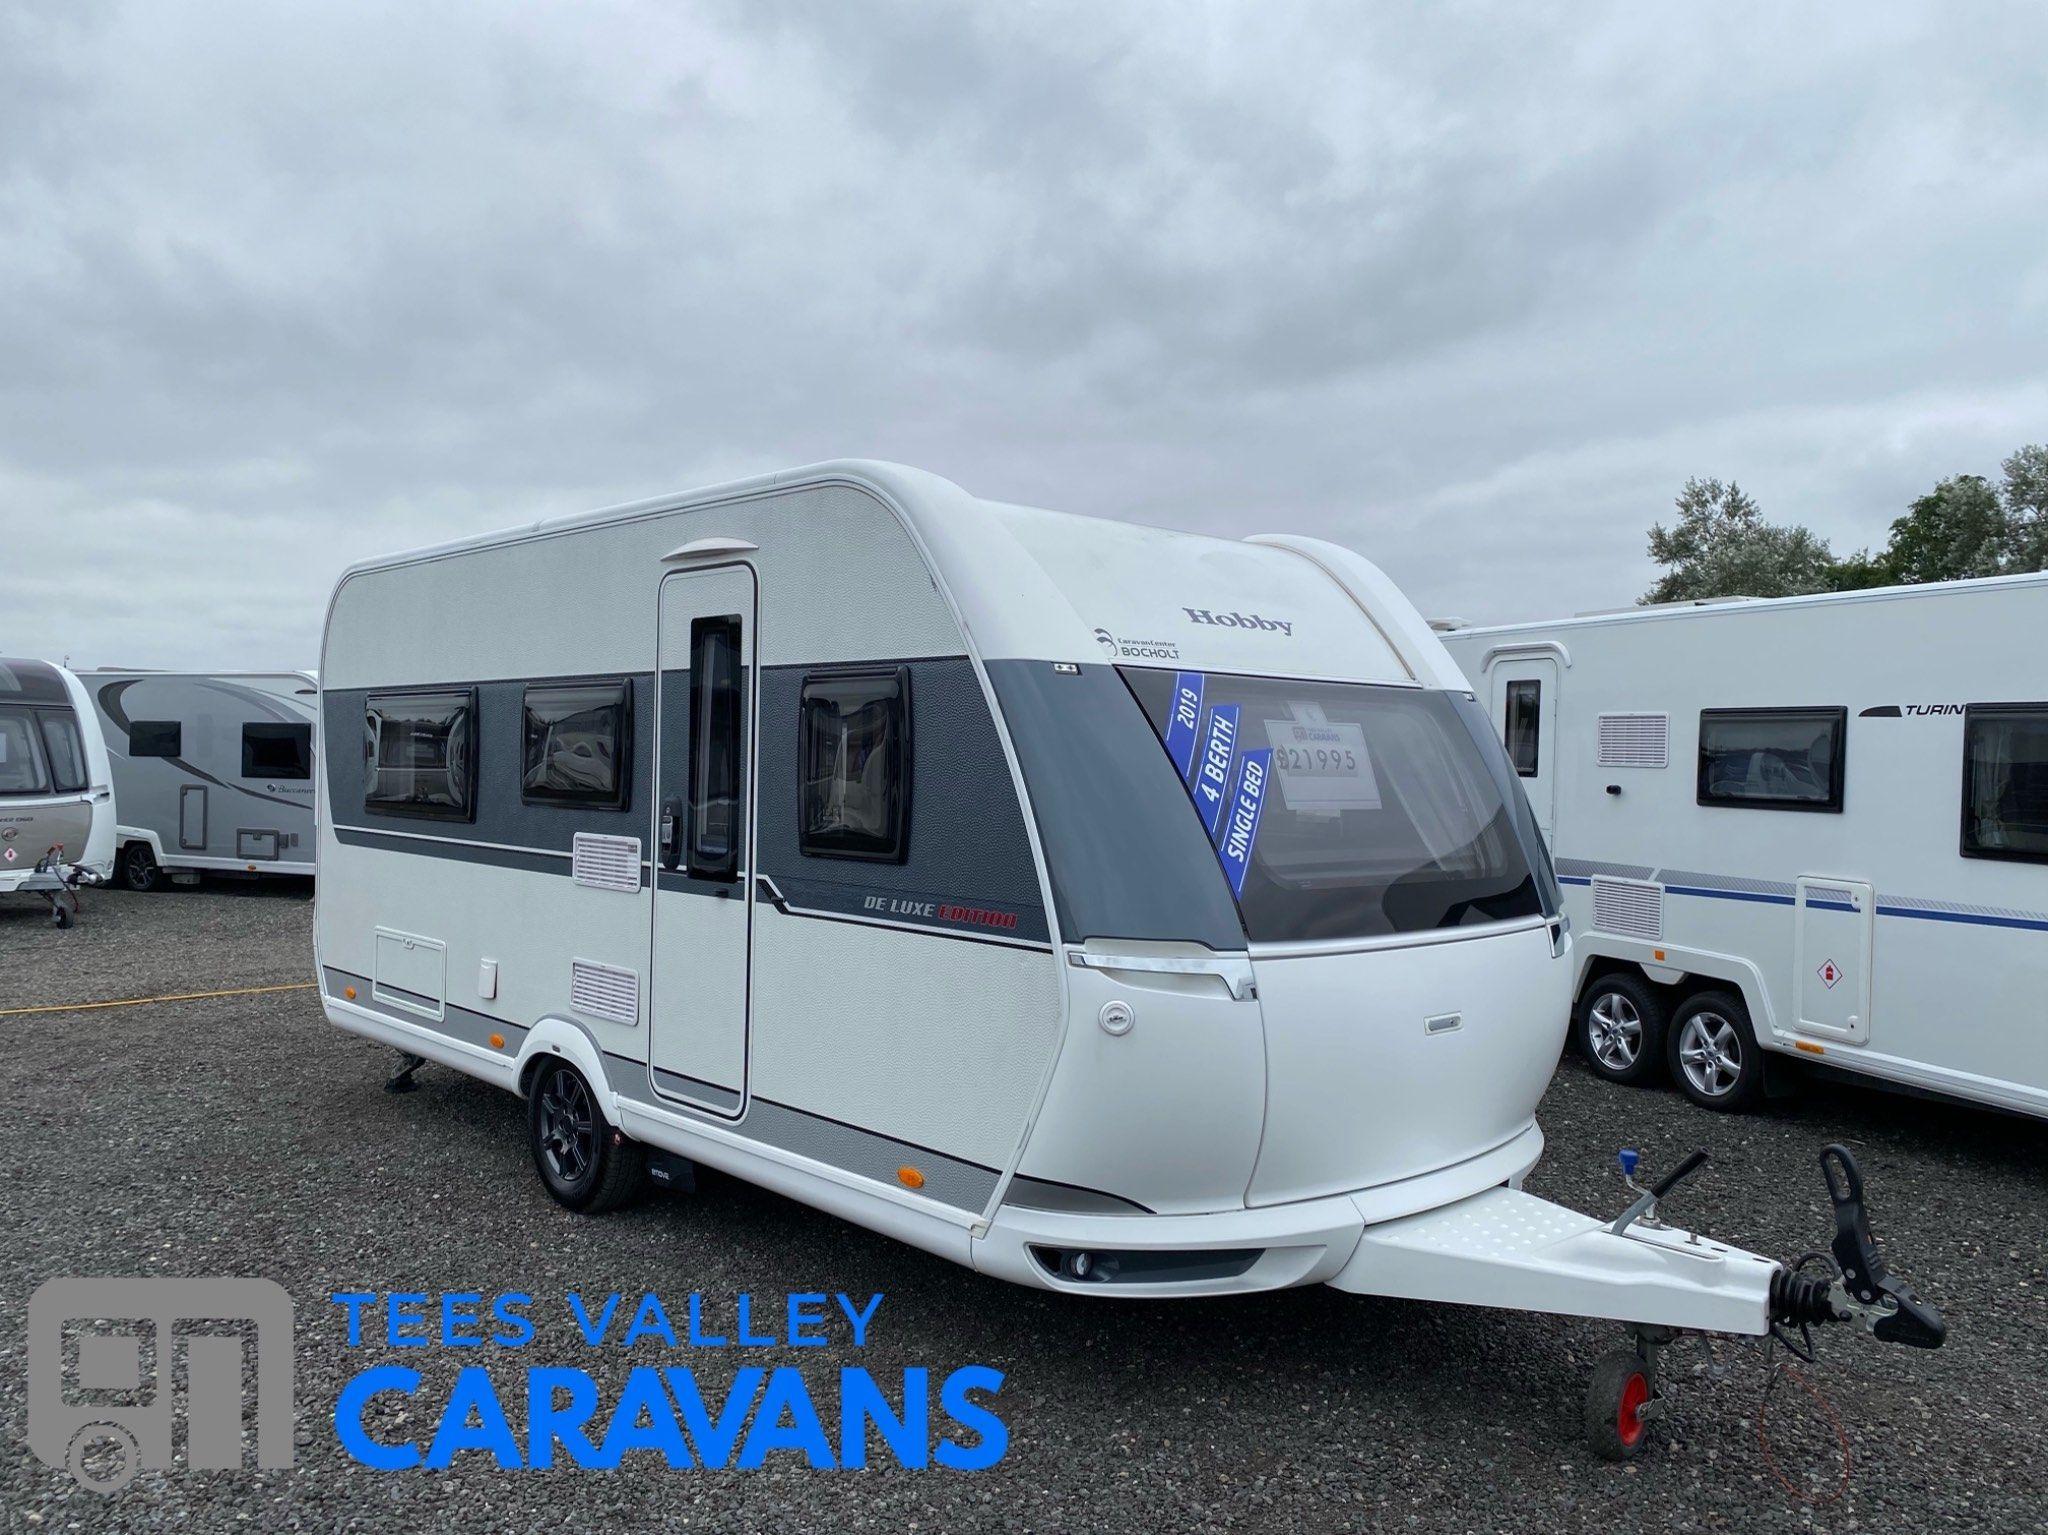 Used Hobby Caravans for sale   AutoTrader Caravans